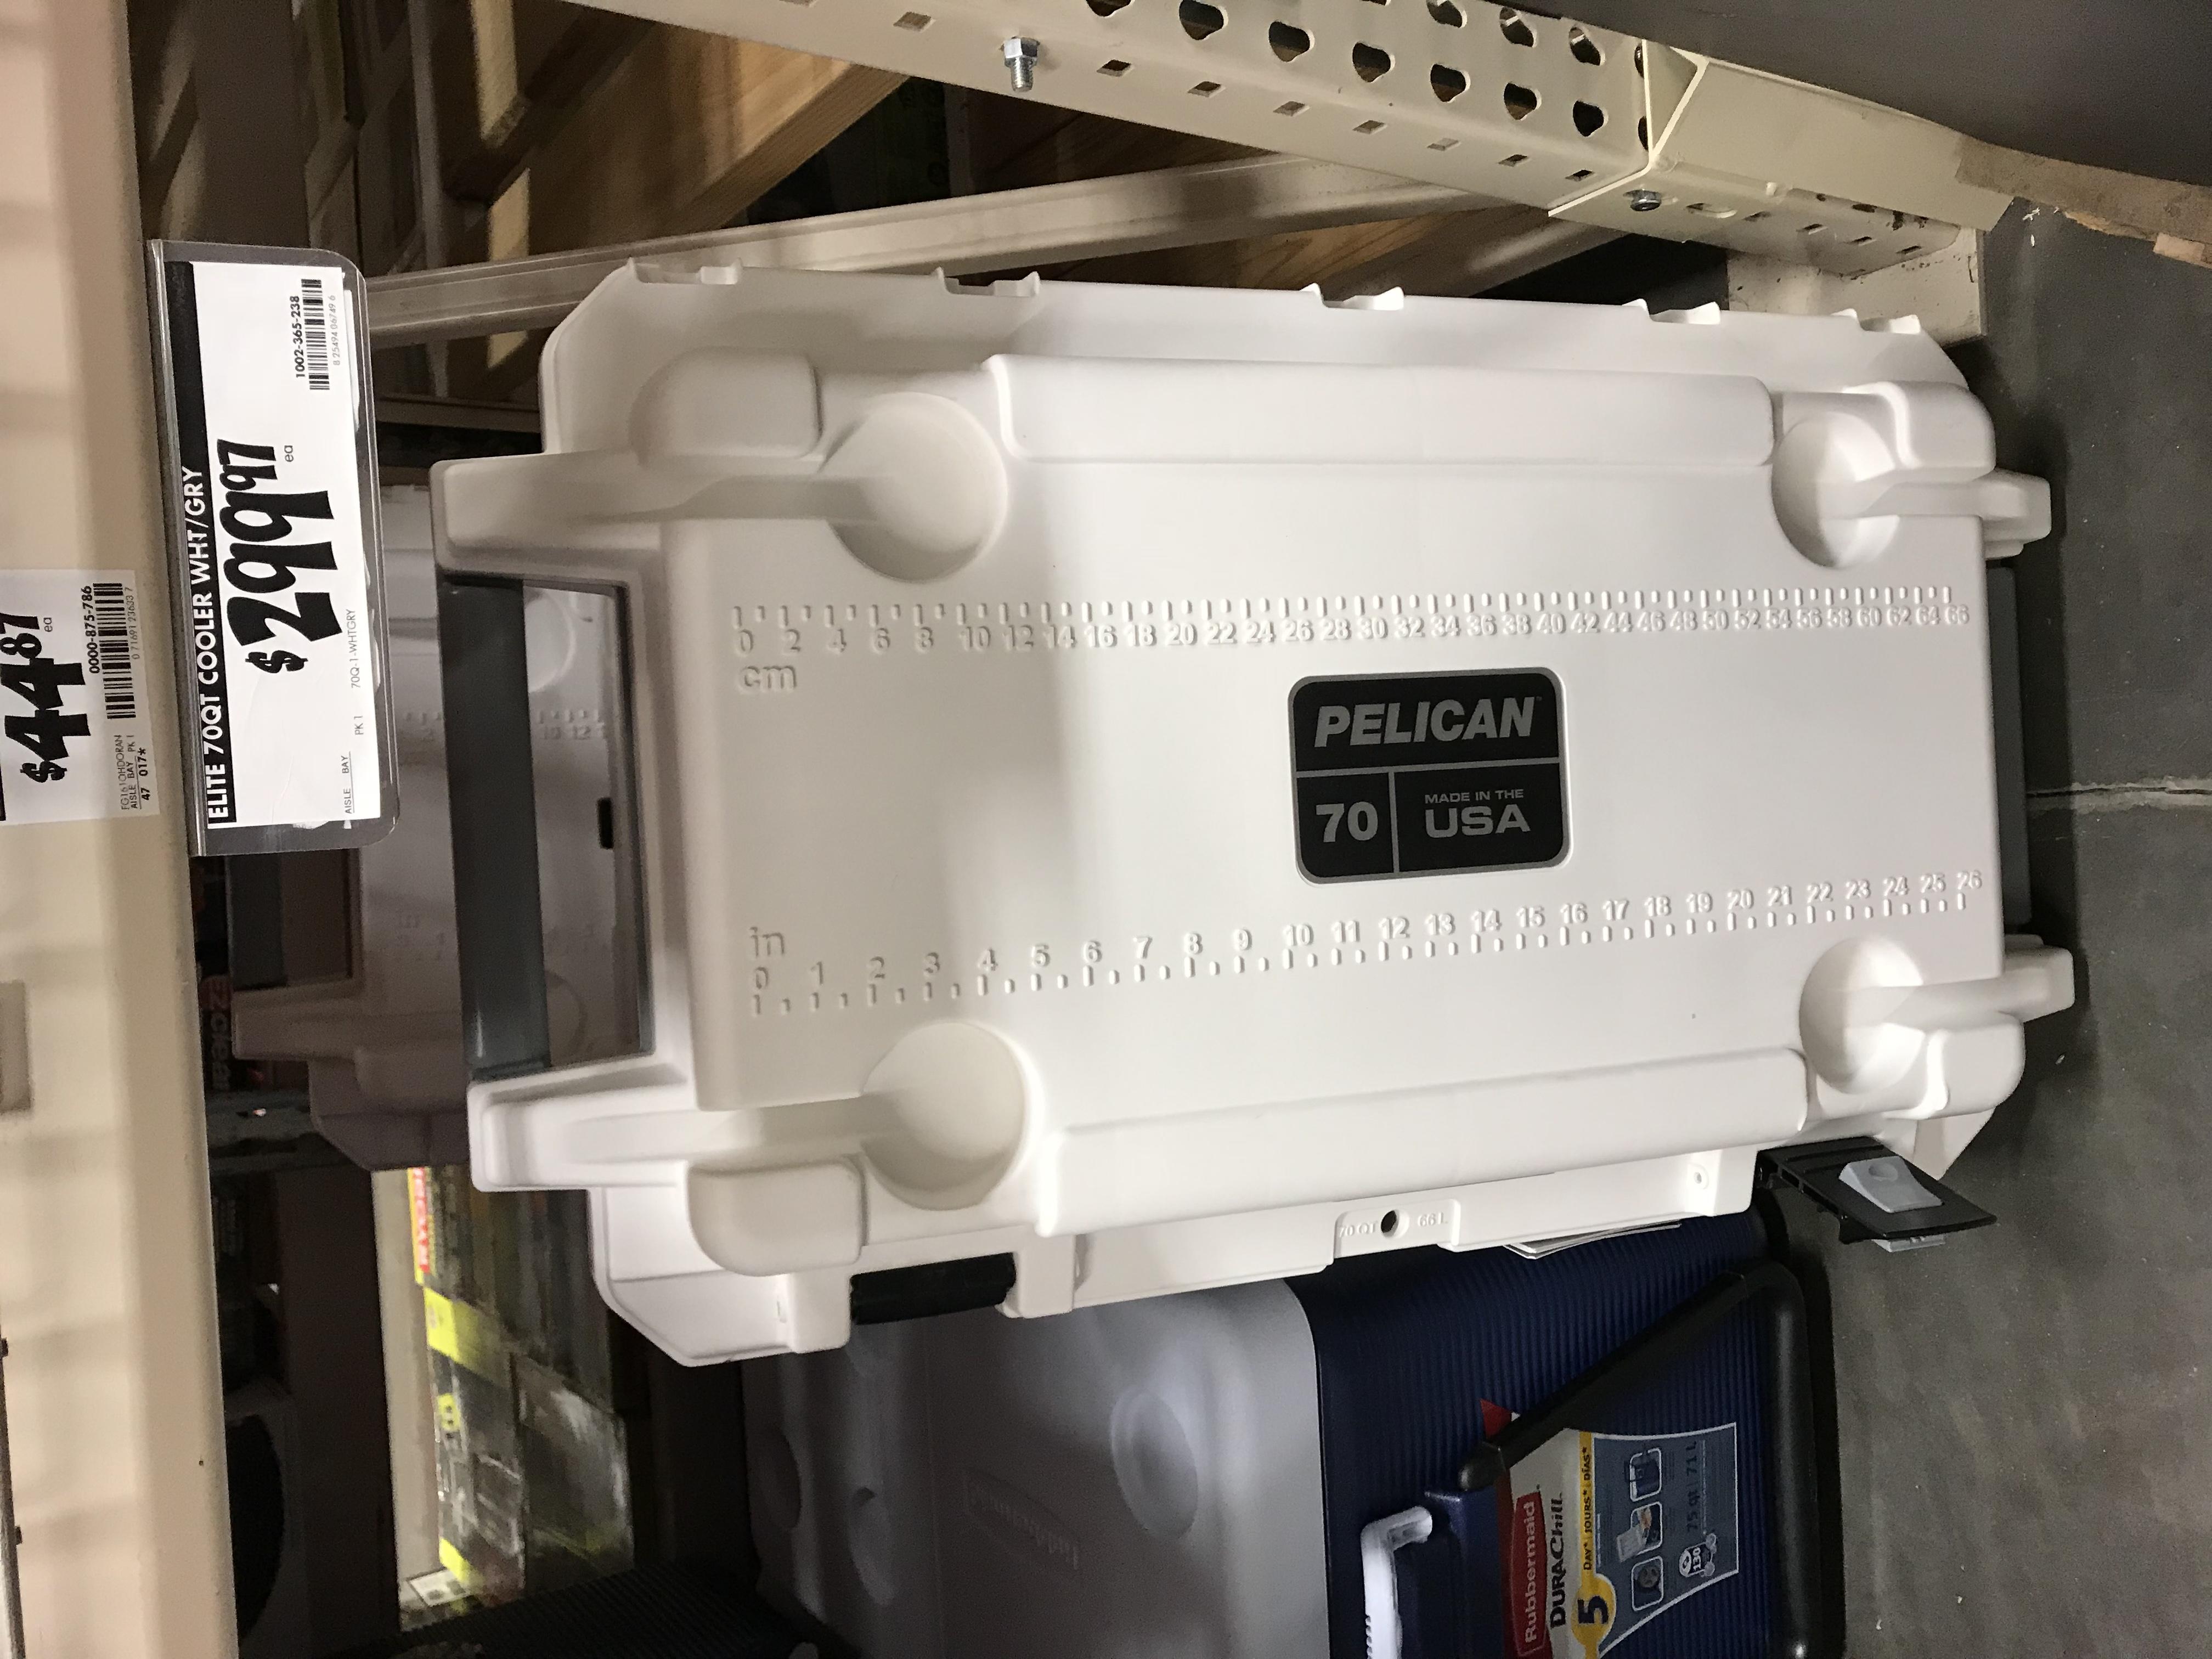 Pelican 70 qt white cooler $299.97 in store YMMV